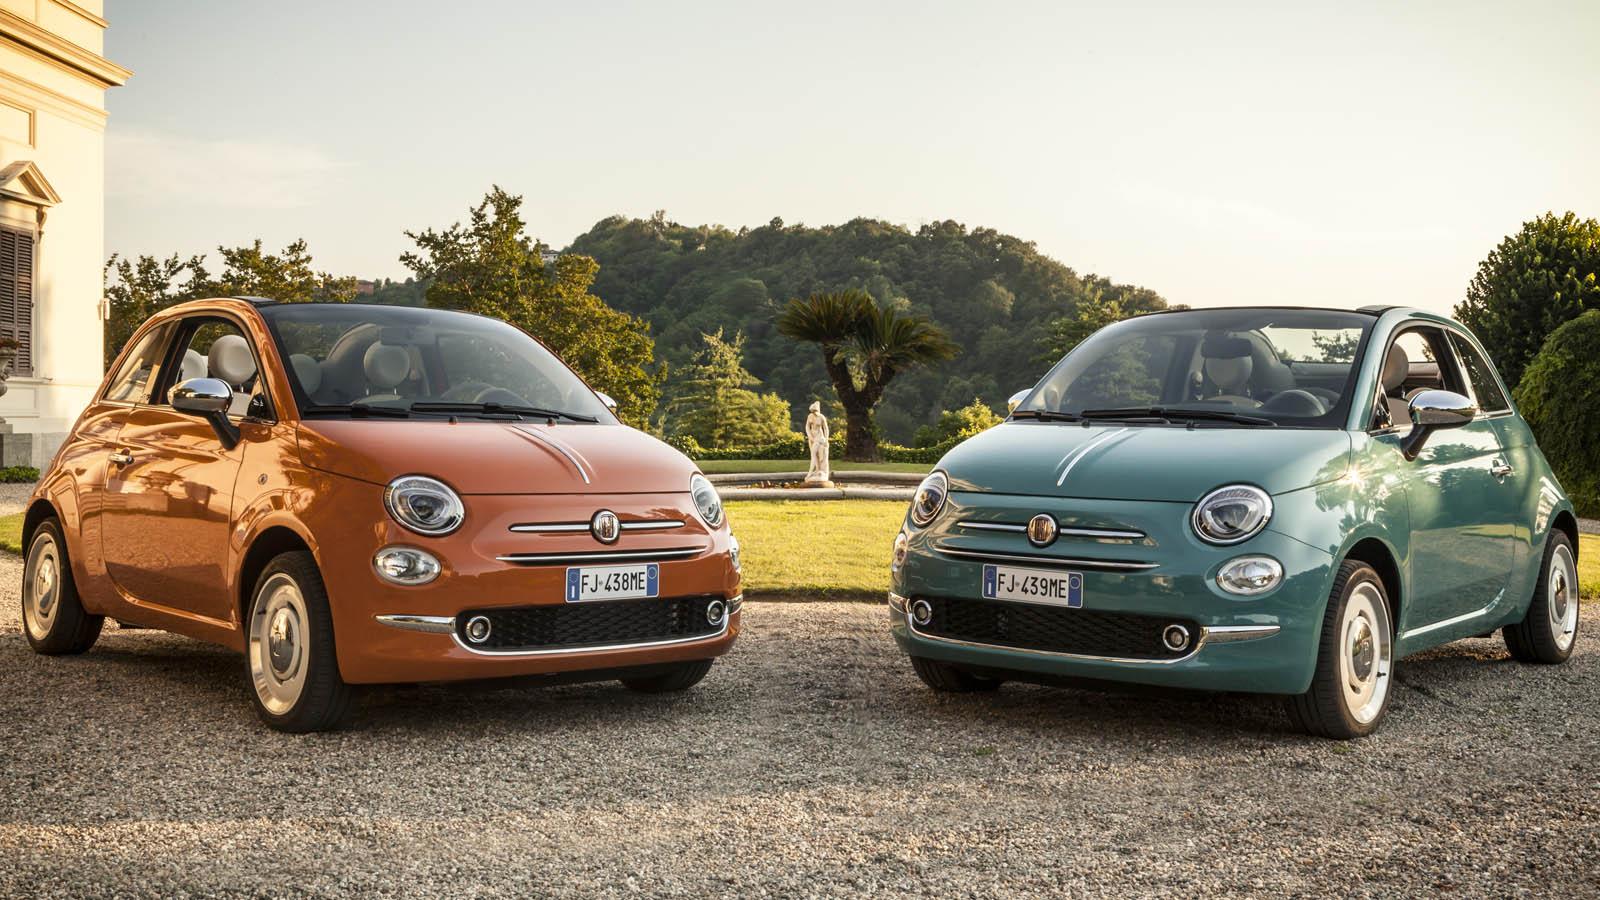 Fiat 500 Anniversario Edition (1)